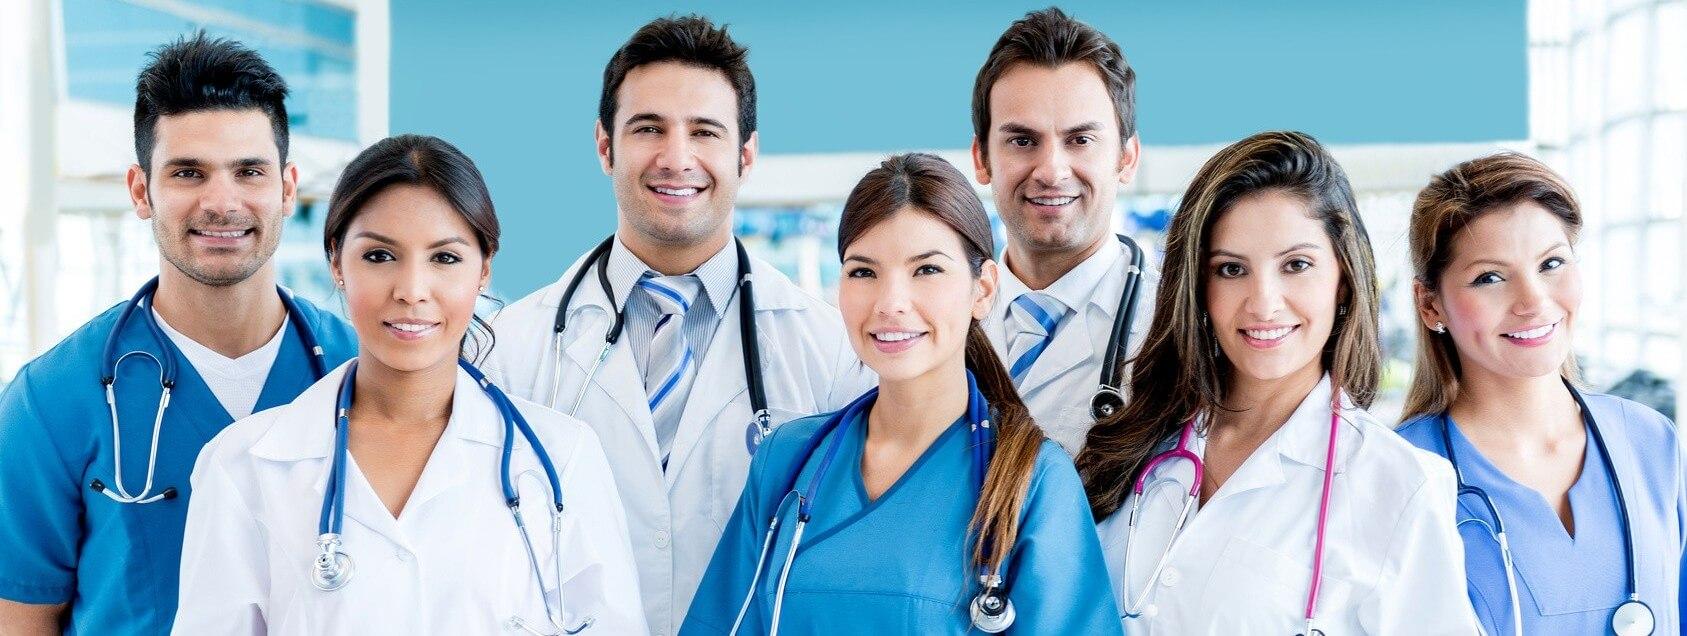 Medicina o Professioni sanitarie